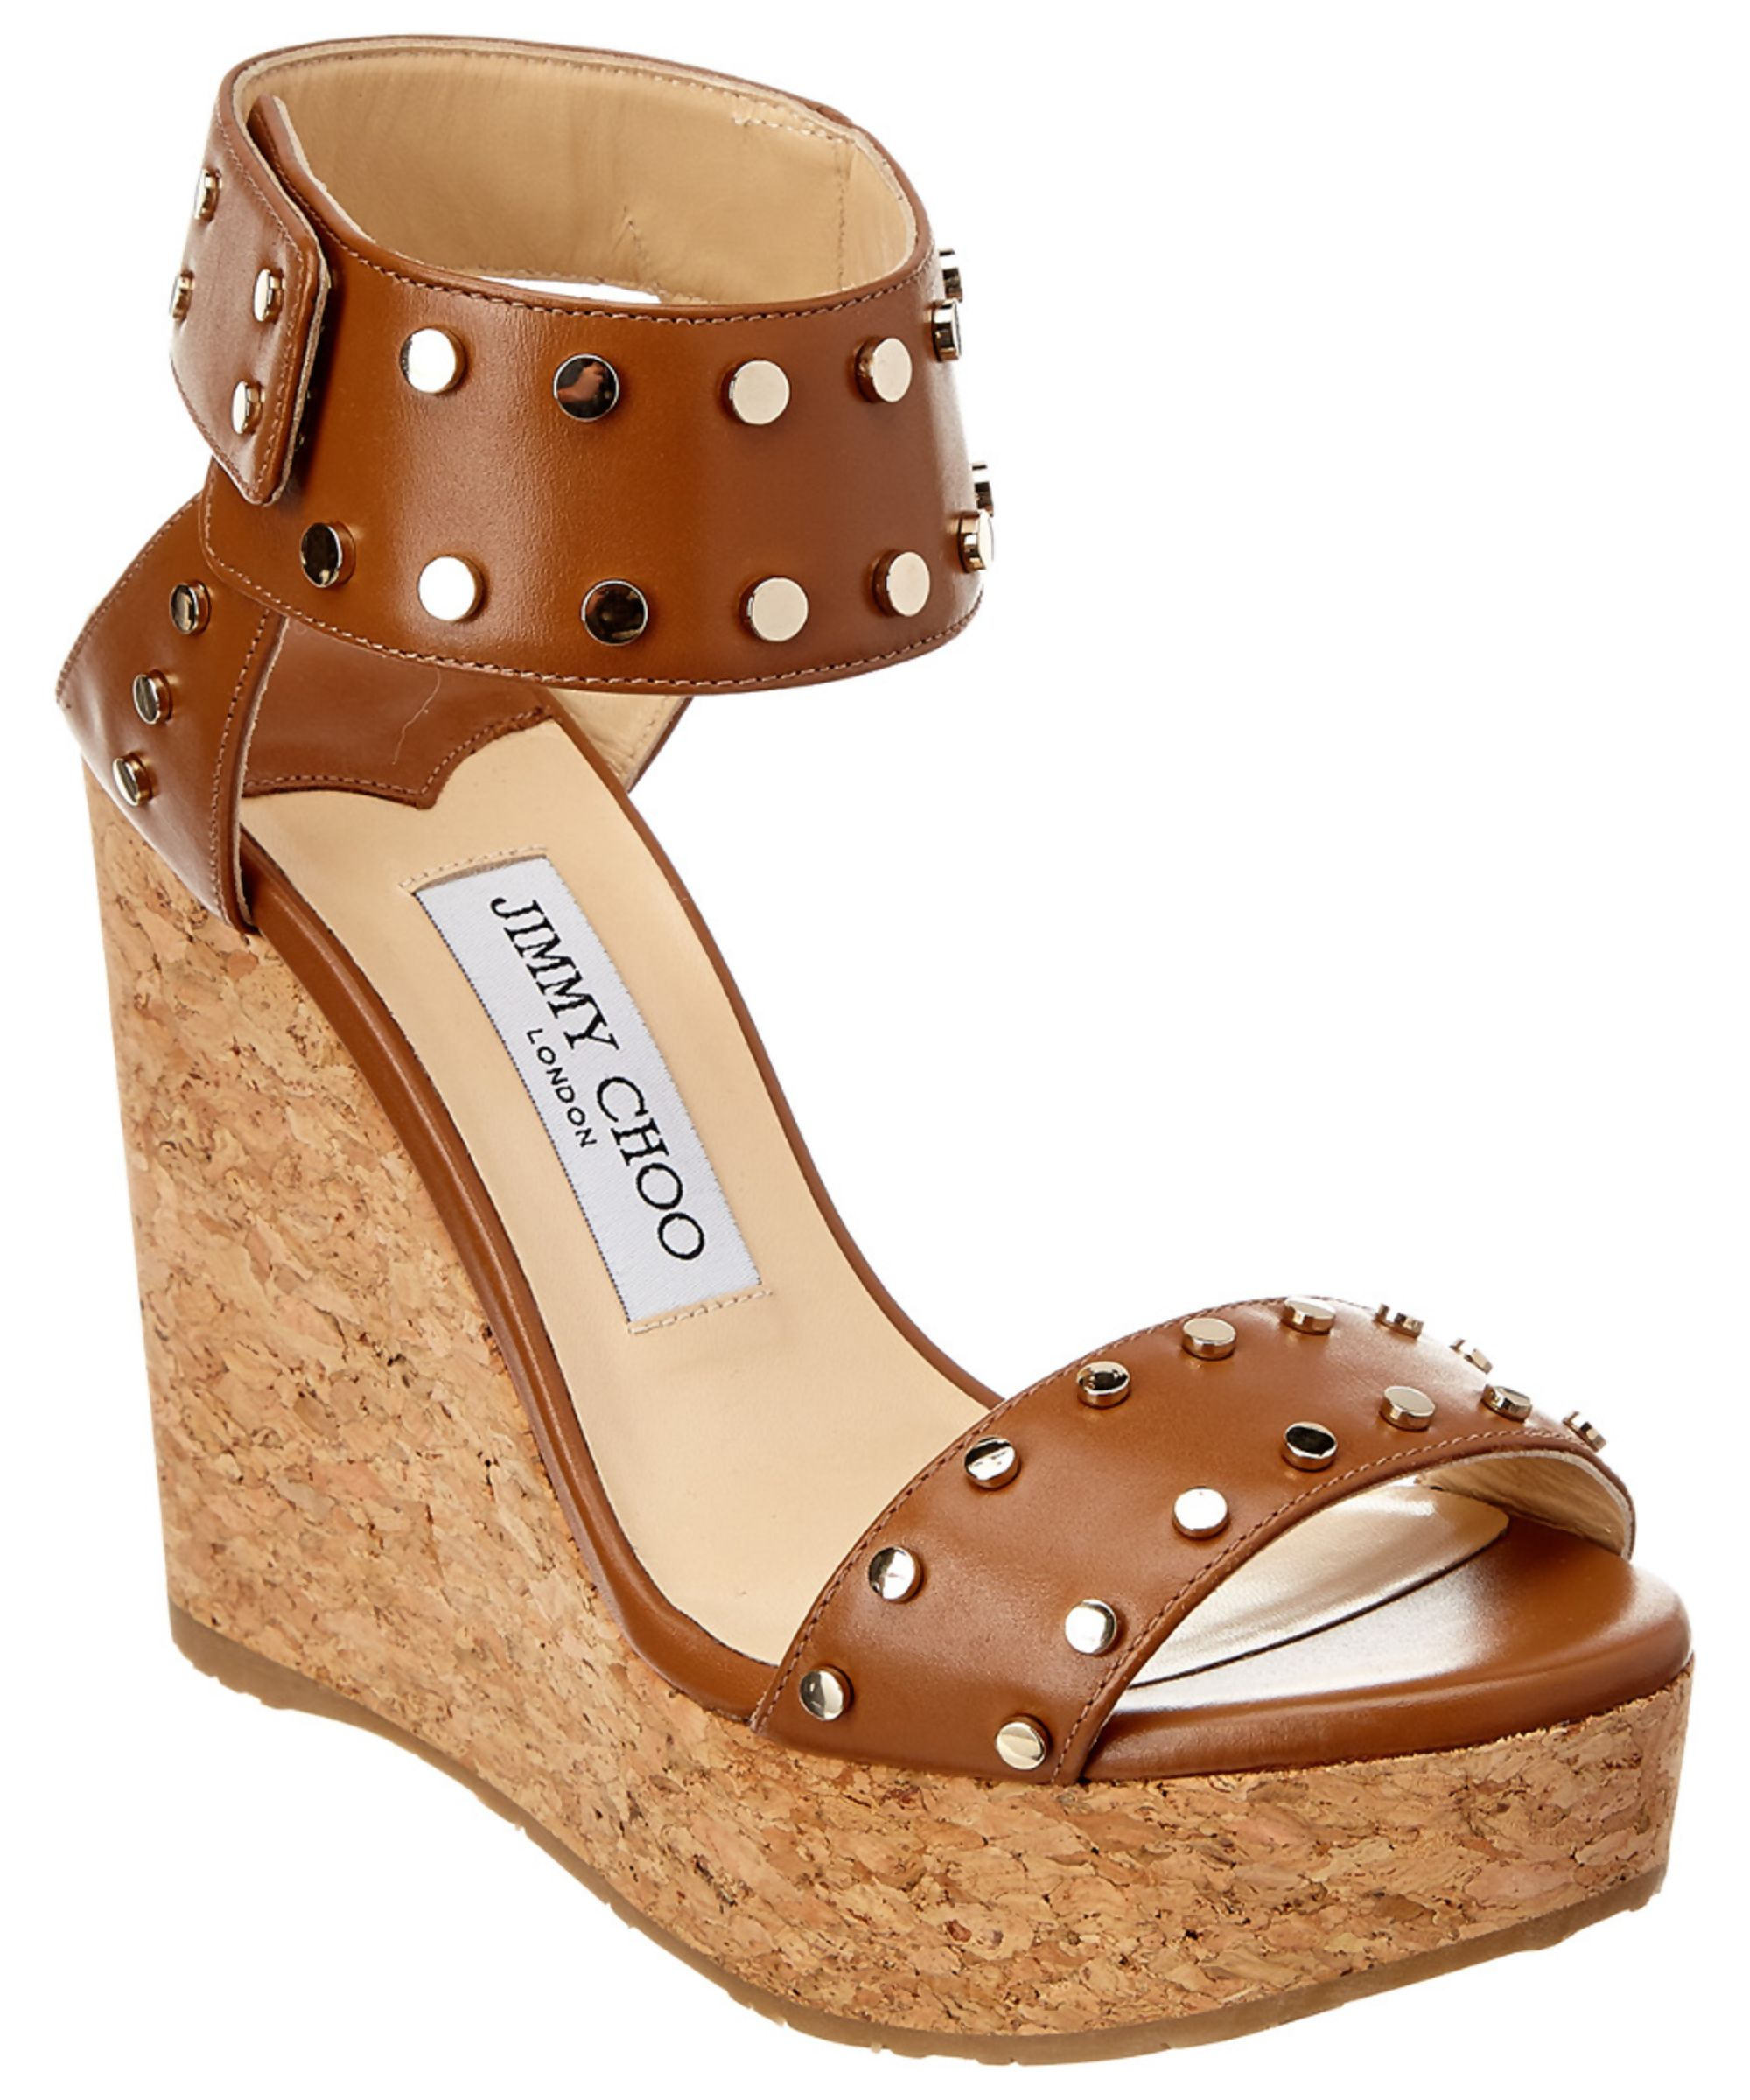 72e7def7989a JIMMY CHOO | Jimmy Choo Nelly 120 Studded Shiny Leather Wedge Sandal #Shoes  #Sandals #JIMMY CHOO